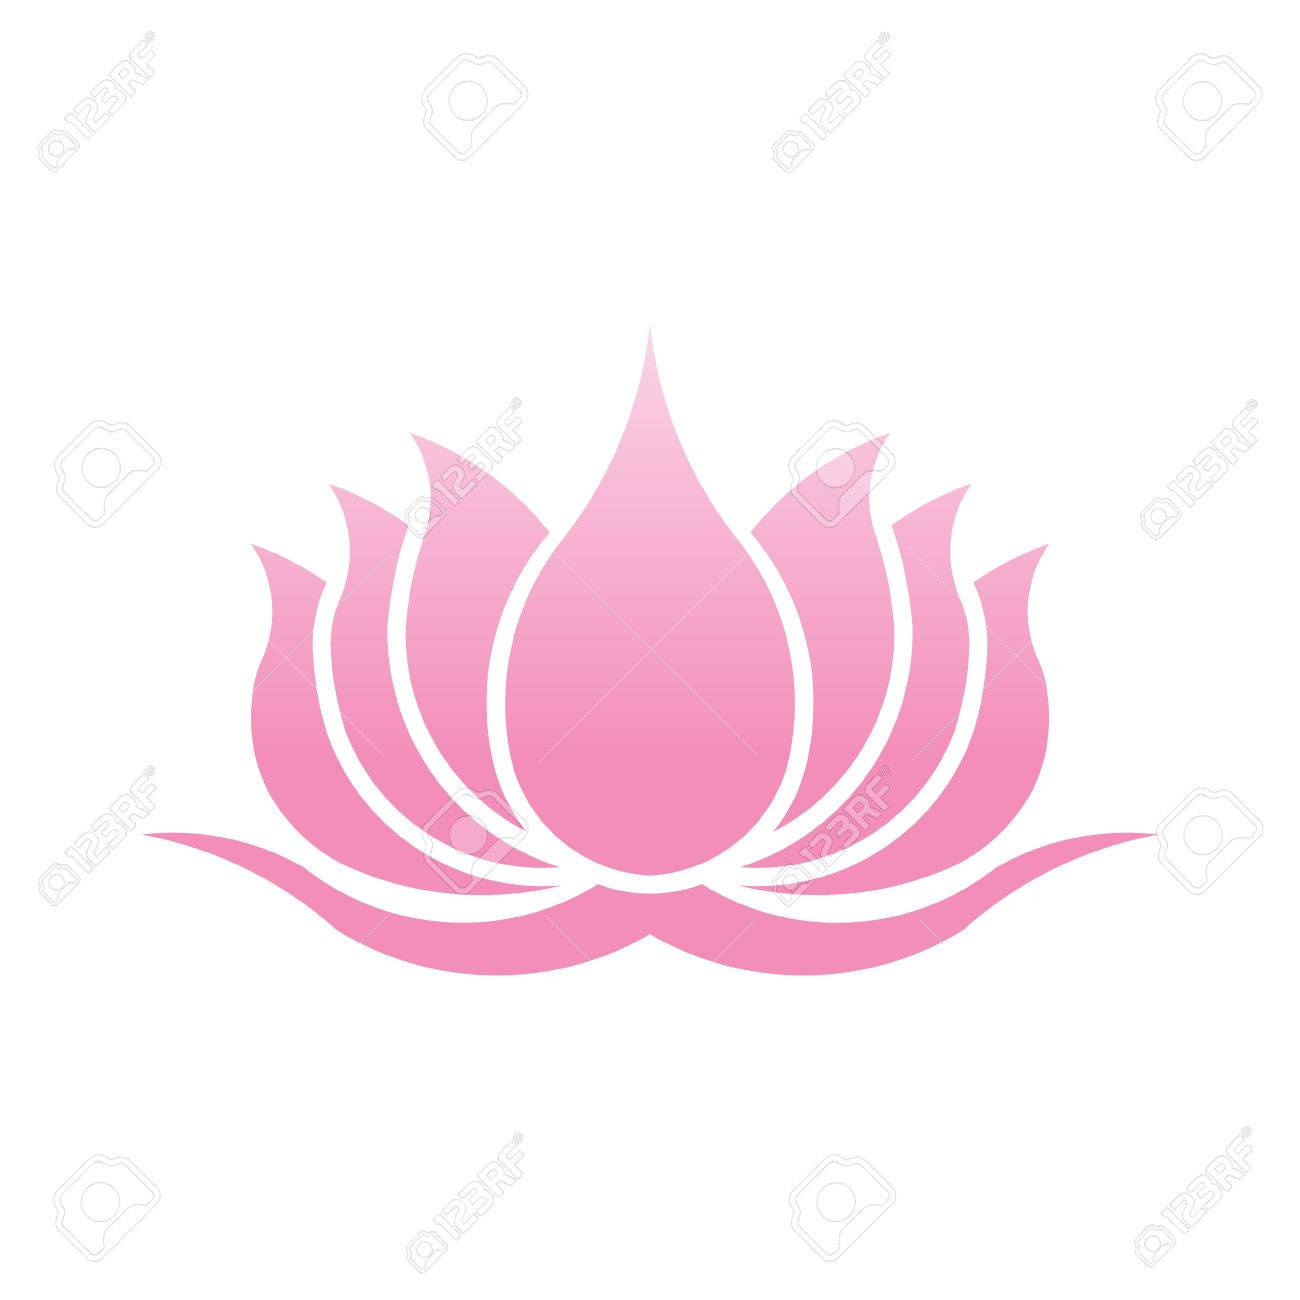 Lotus flower logo vector design illustration royalty free cliparts lotus flower logo vector design illustration stock vector 74131171 mightylinksfo